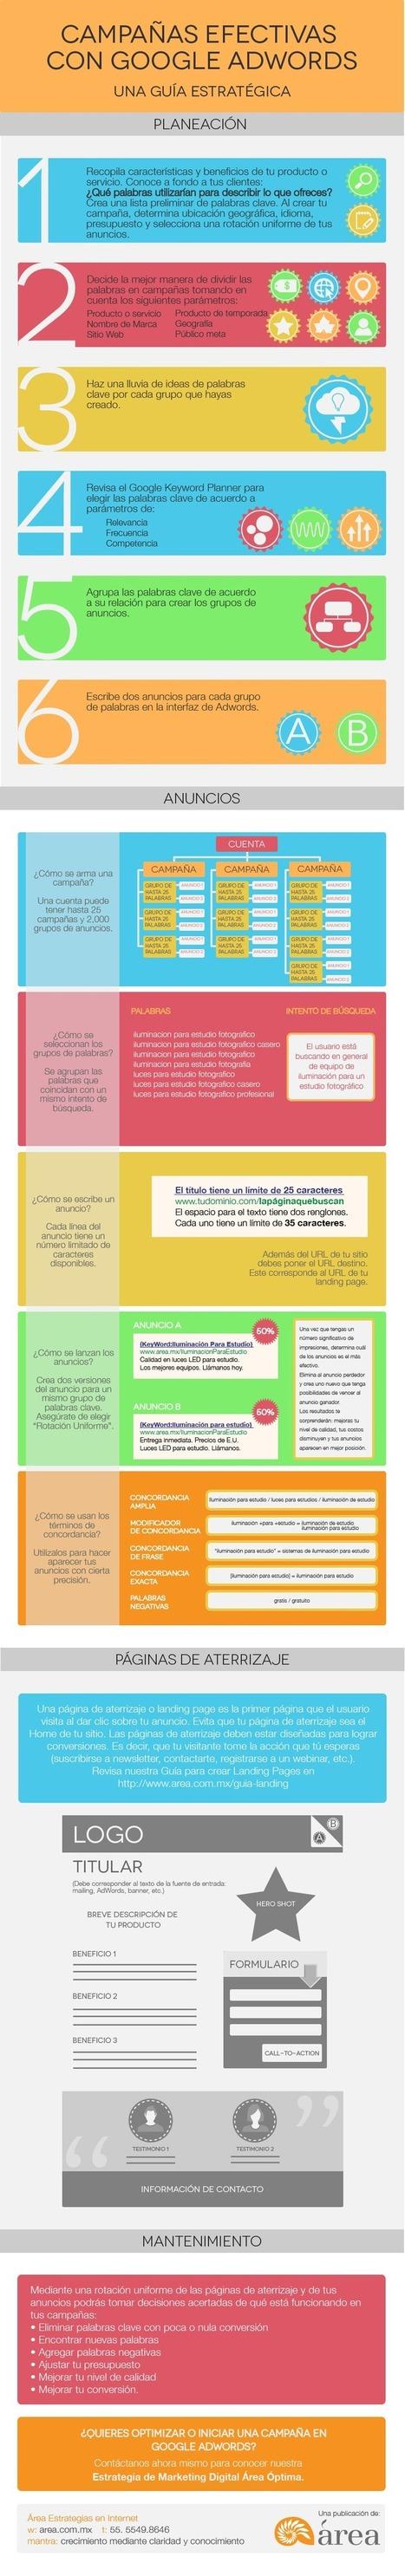 Campañas efectivas de Google Adwords #infografia #infographic #marketing | Emprende Online | Scoop.it